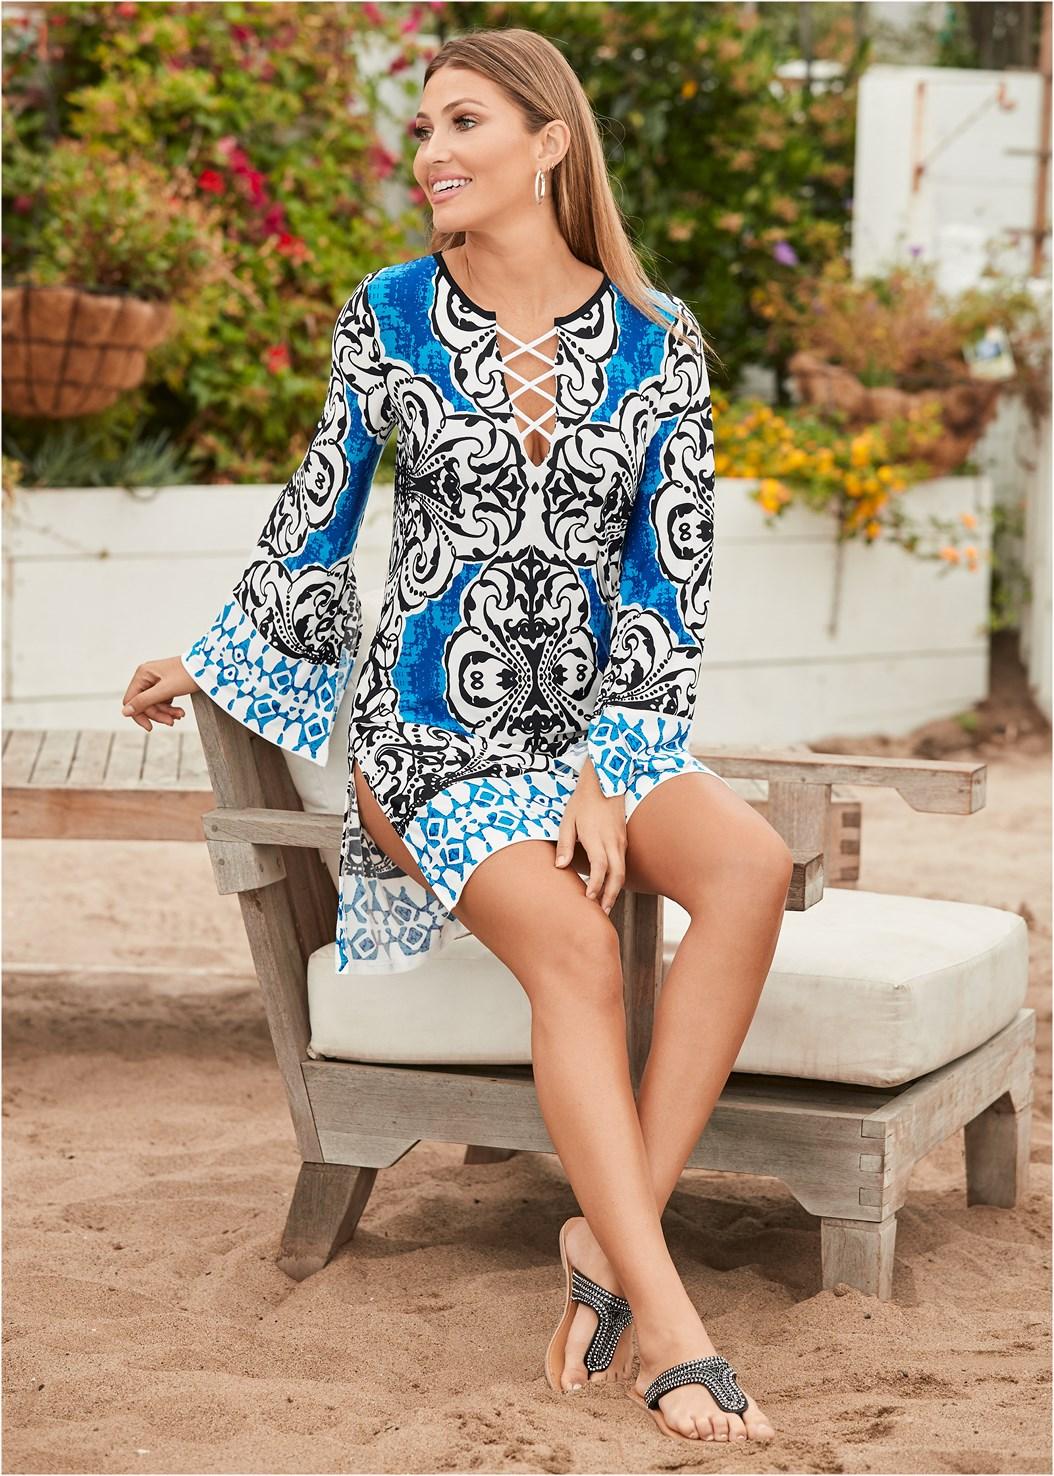 Printed Cover-Up Dress,Triangle String Bikini Top